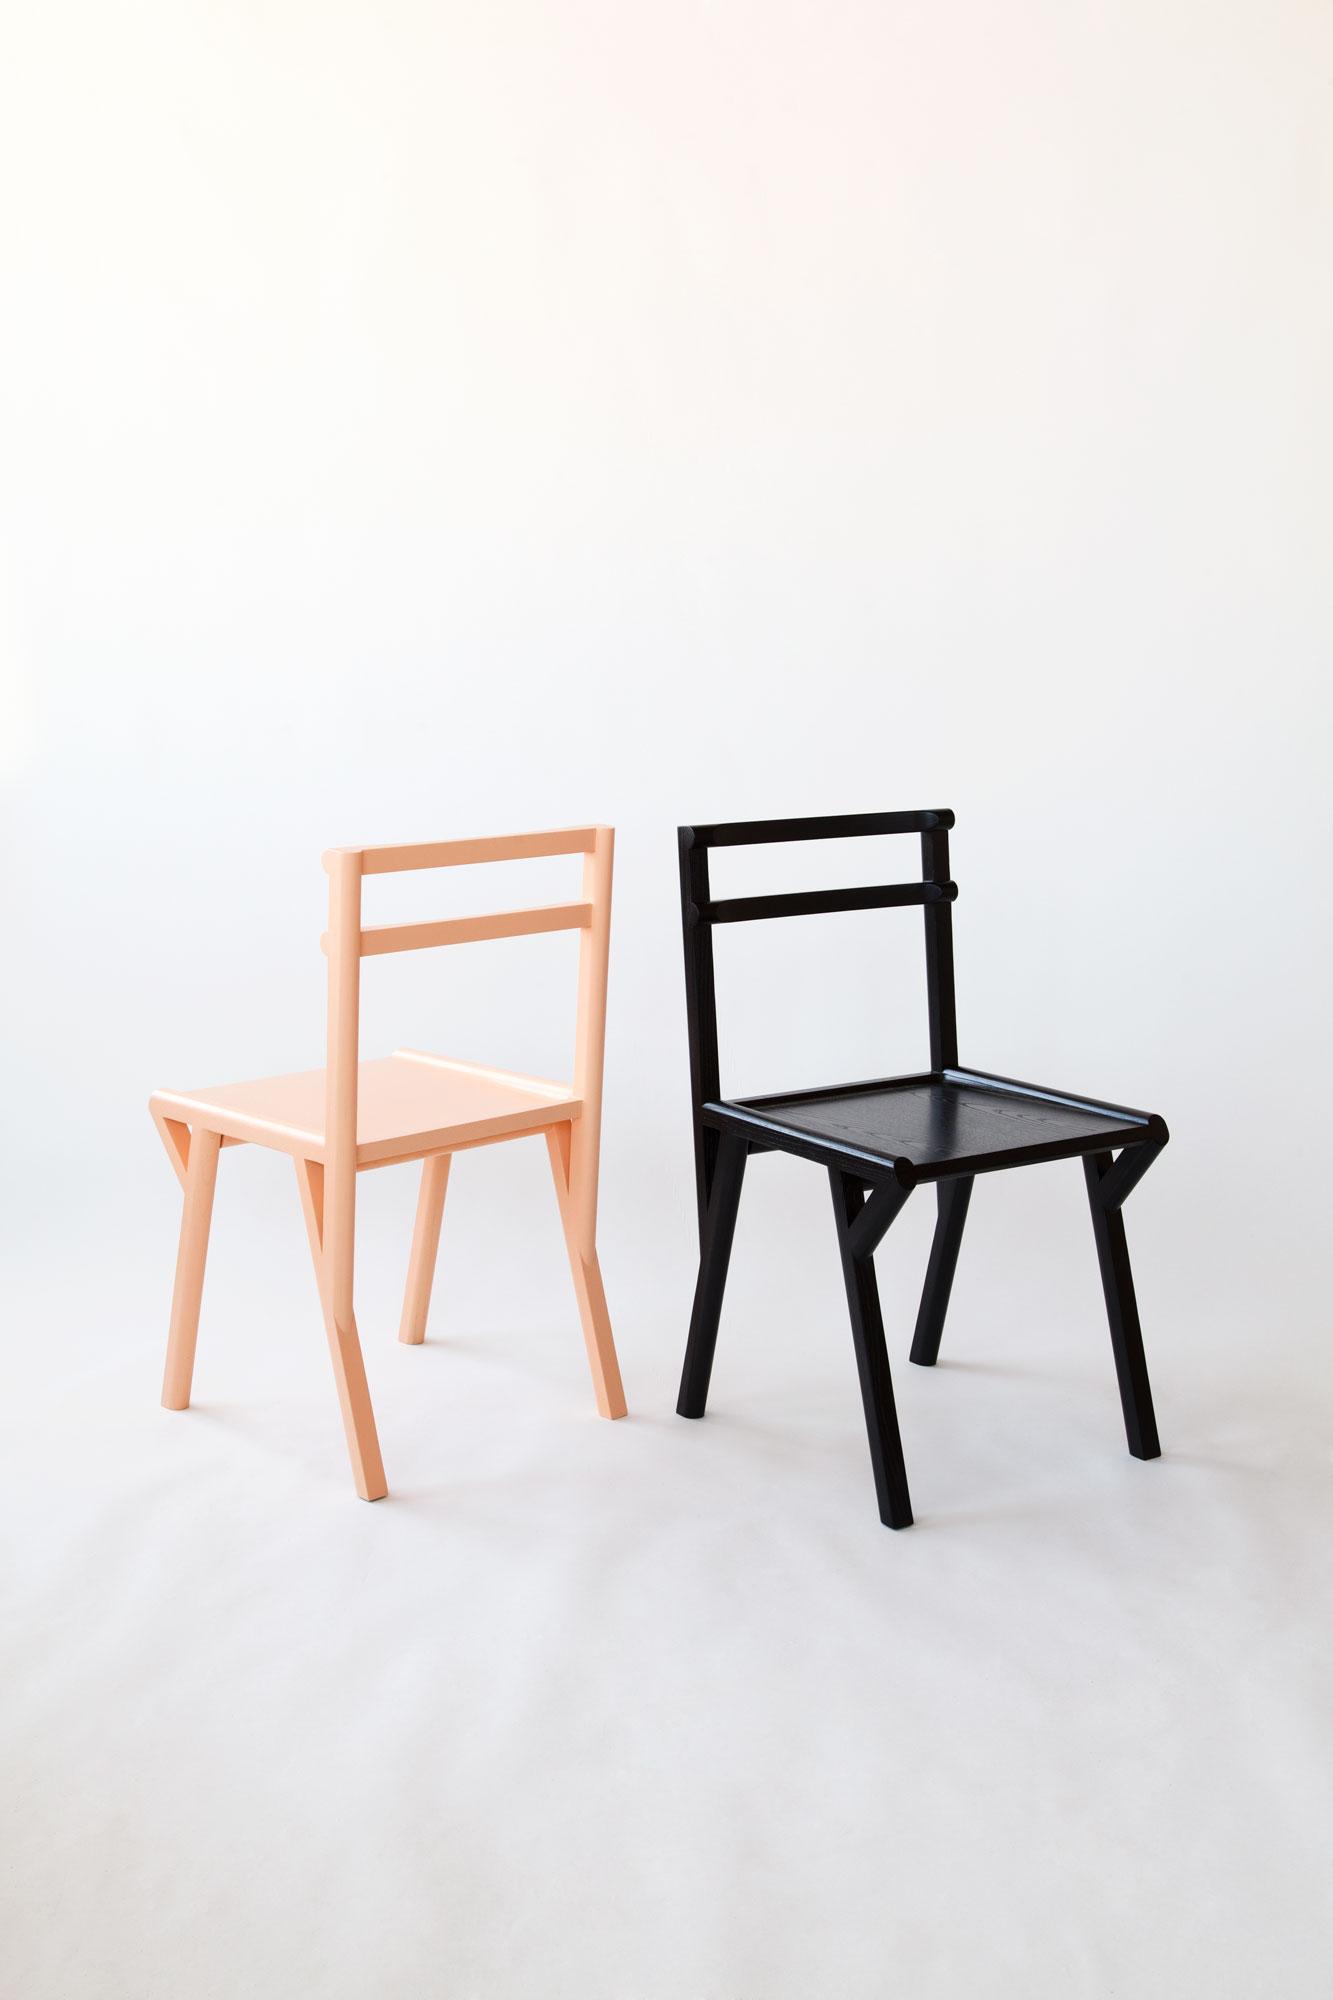 Attirant Half Moon Chair 1.